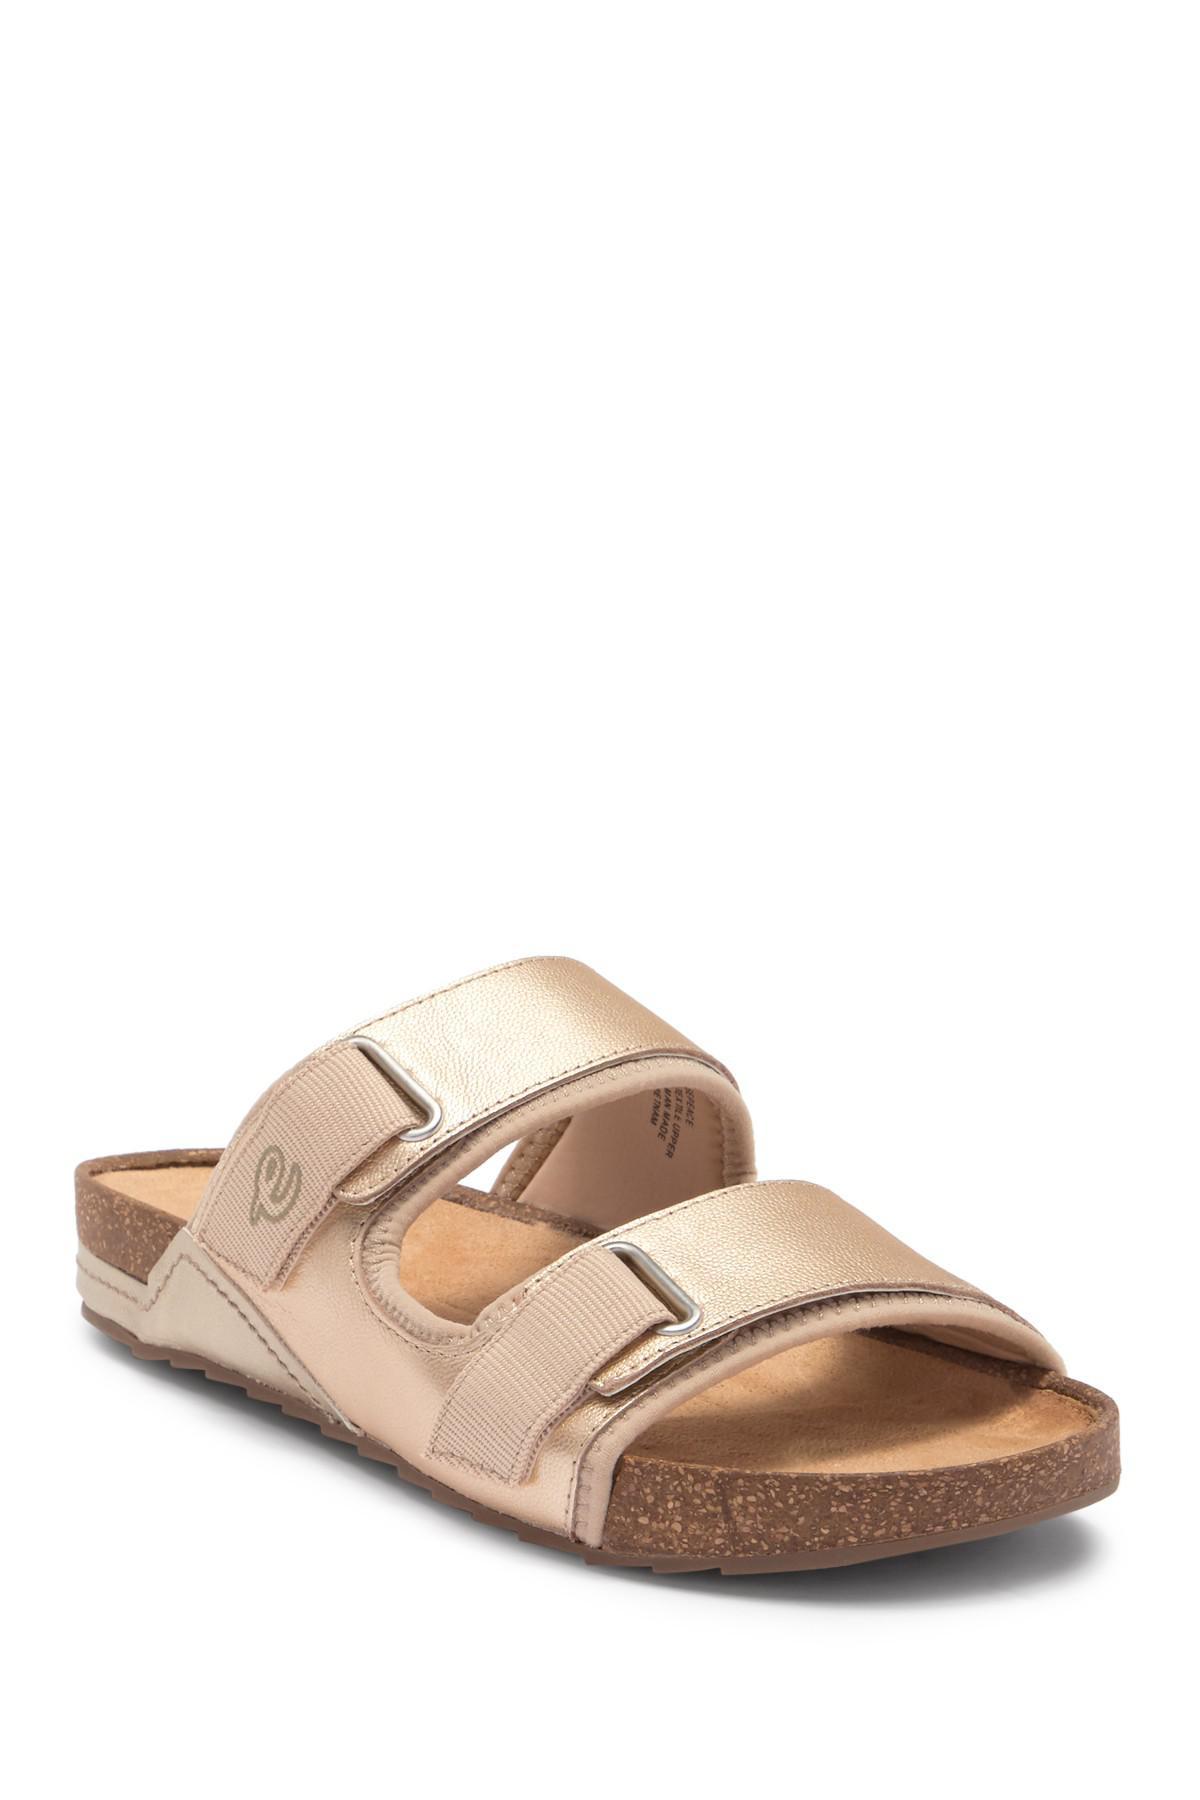 16ea5f9fa919 Lyst - Easy Spirit Peace Slide Sandal - Wide Width Available